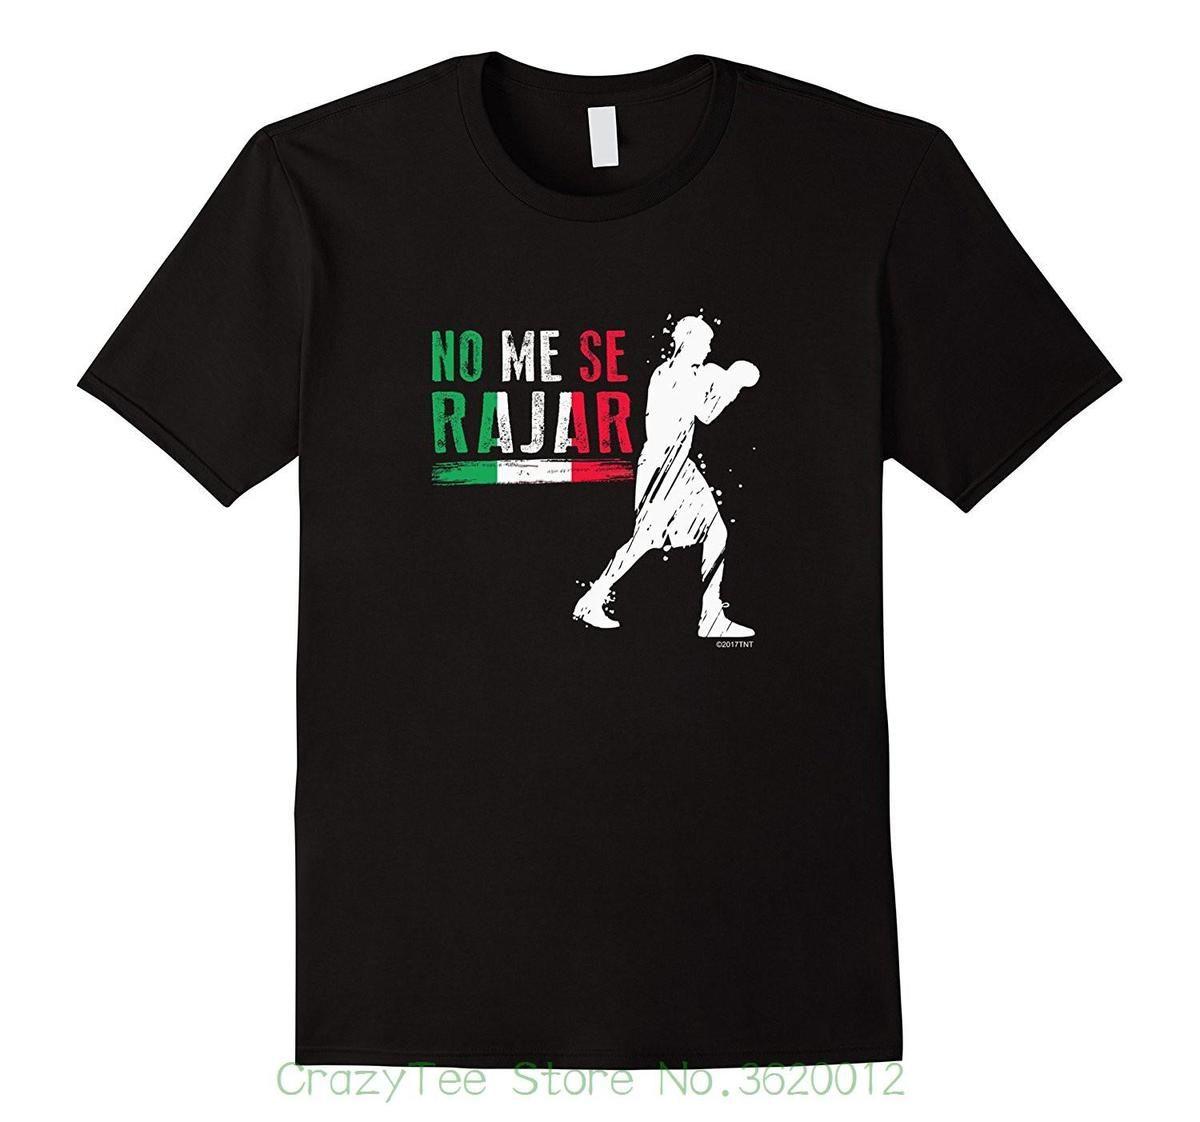 Compre Calidad Imprimir Nuevo Verano Estilo Algodón México Boxer No Me Se  Rajar Orgullo Mexicano Mejor Precio Camiseta A  11.87 Del Liguo0032  b01e0e8e4e3d1